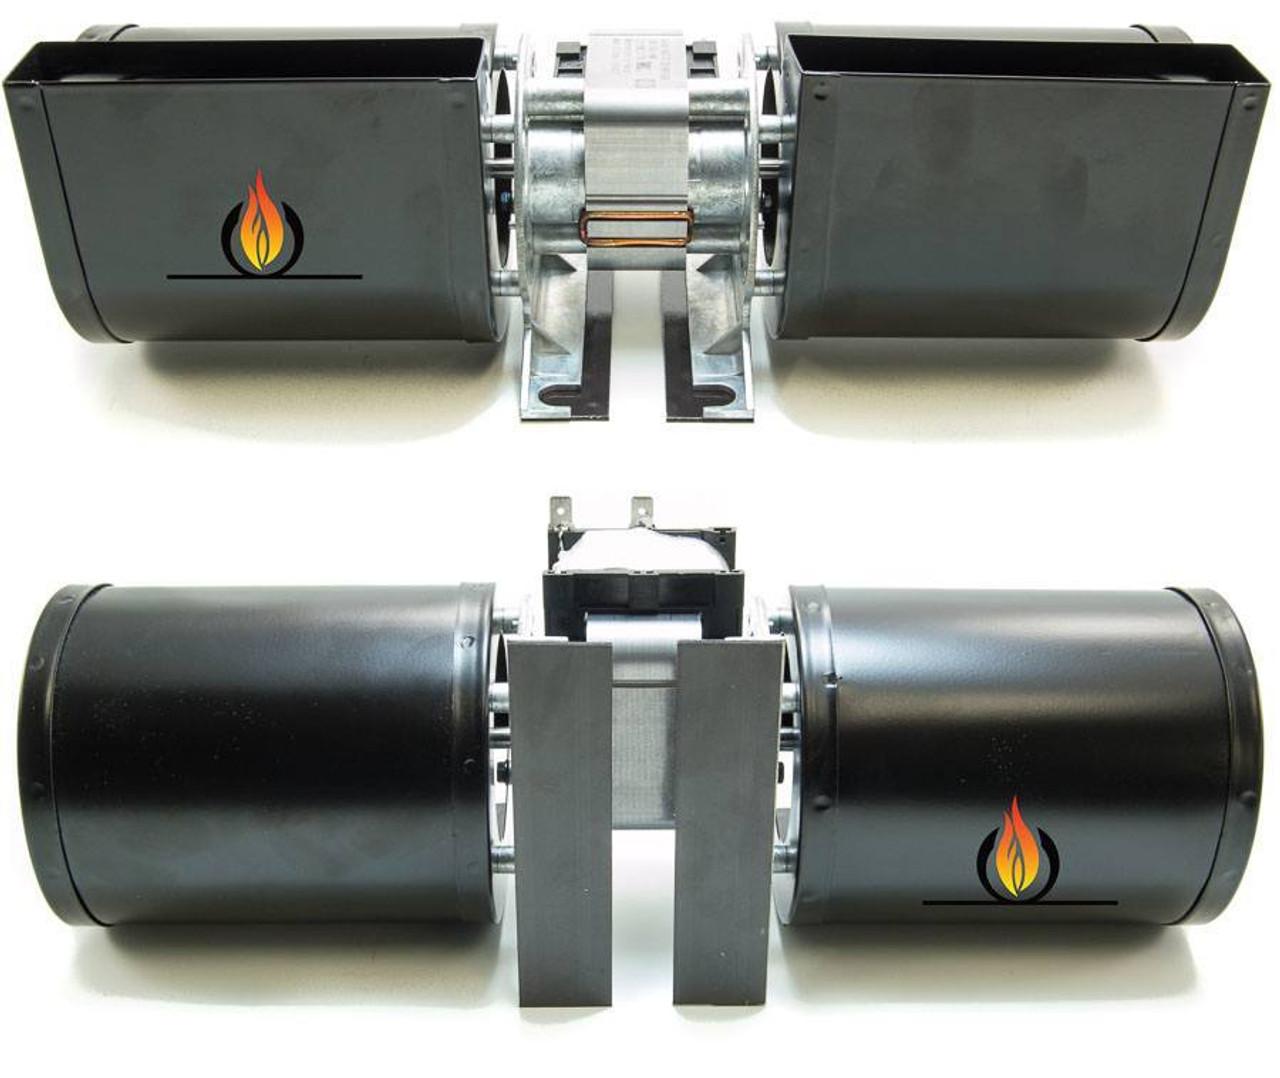 Gfk 160a Gfk160 Gfk 160b Replacement Fireplace Blower Fan